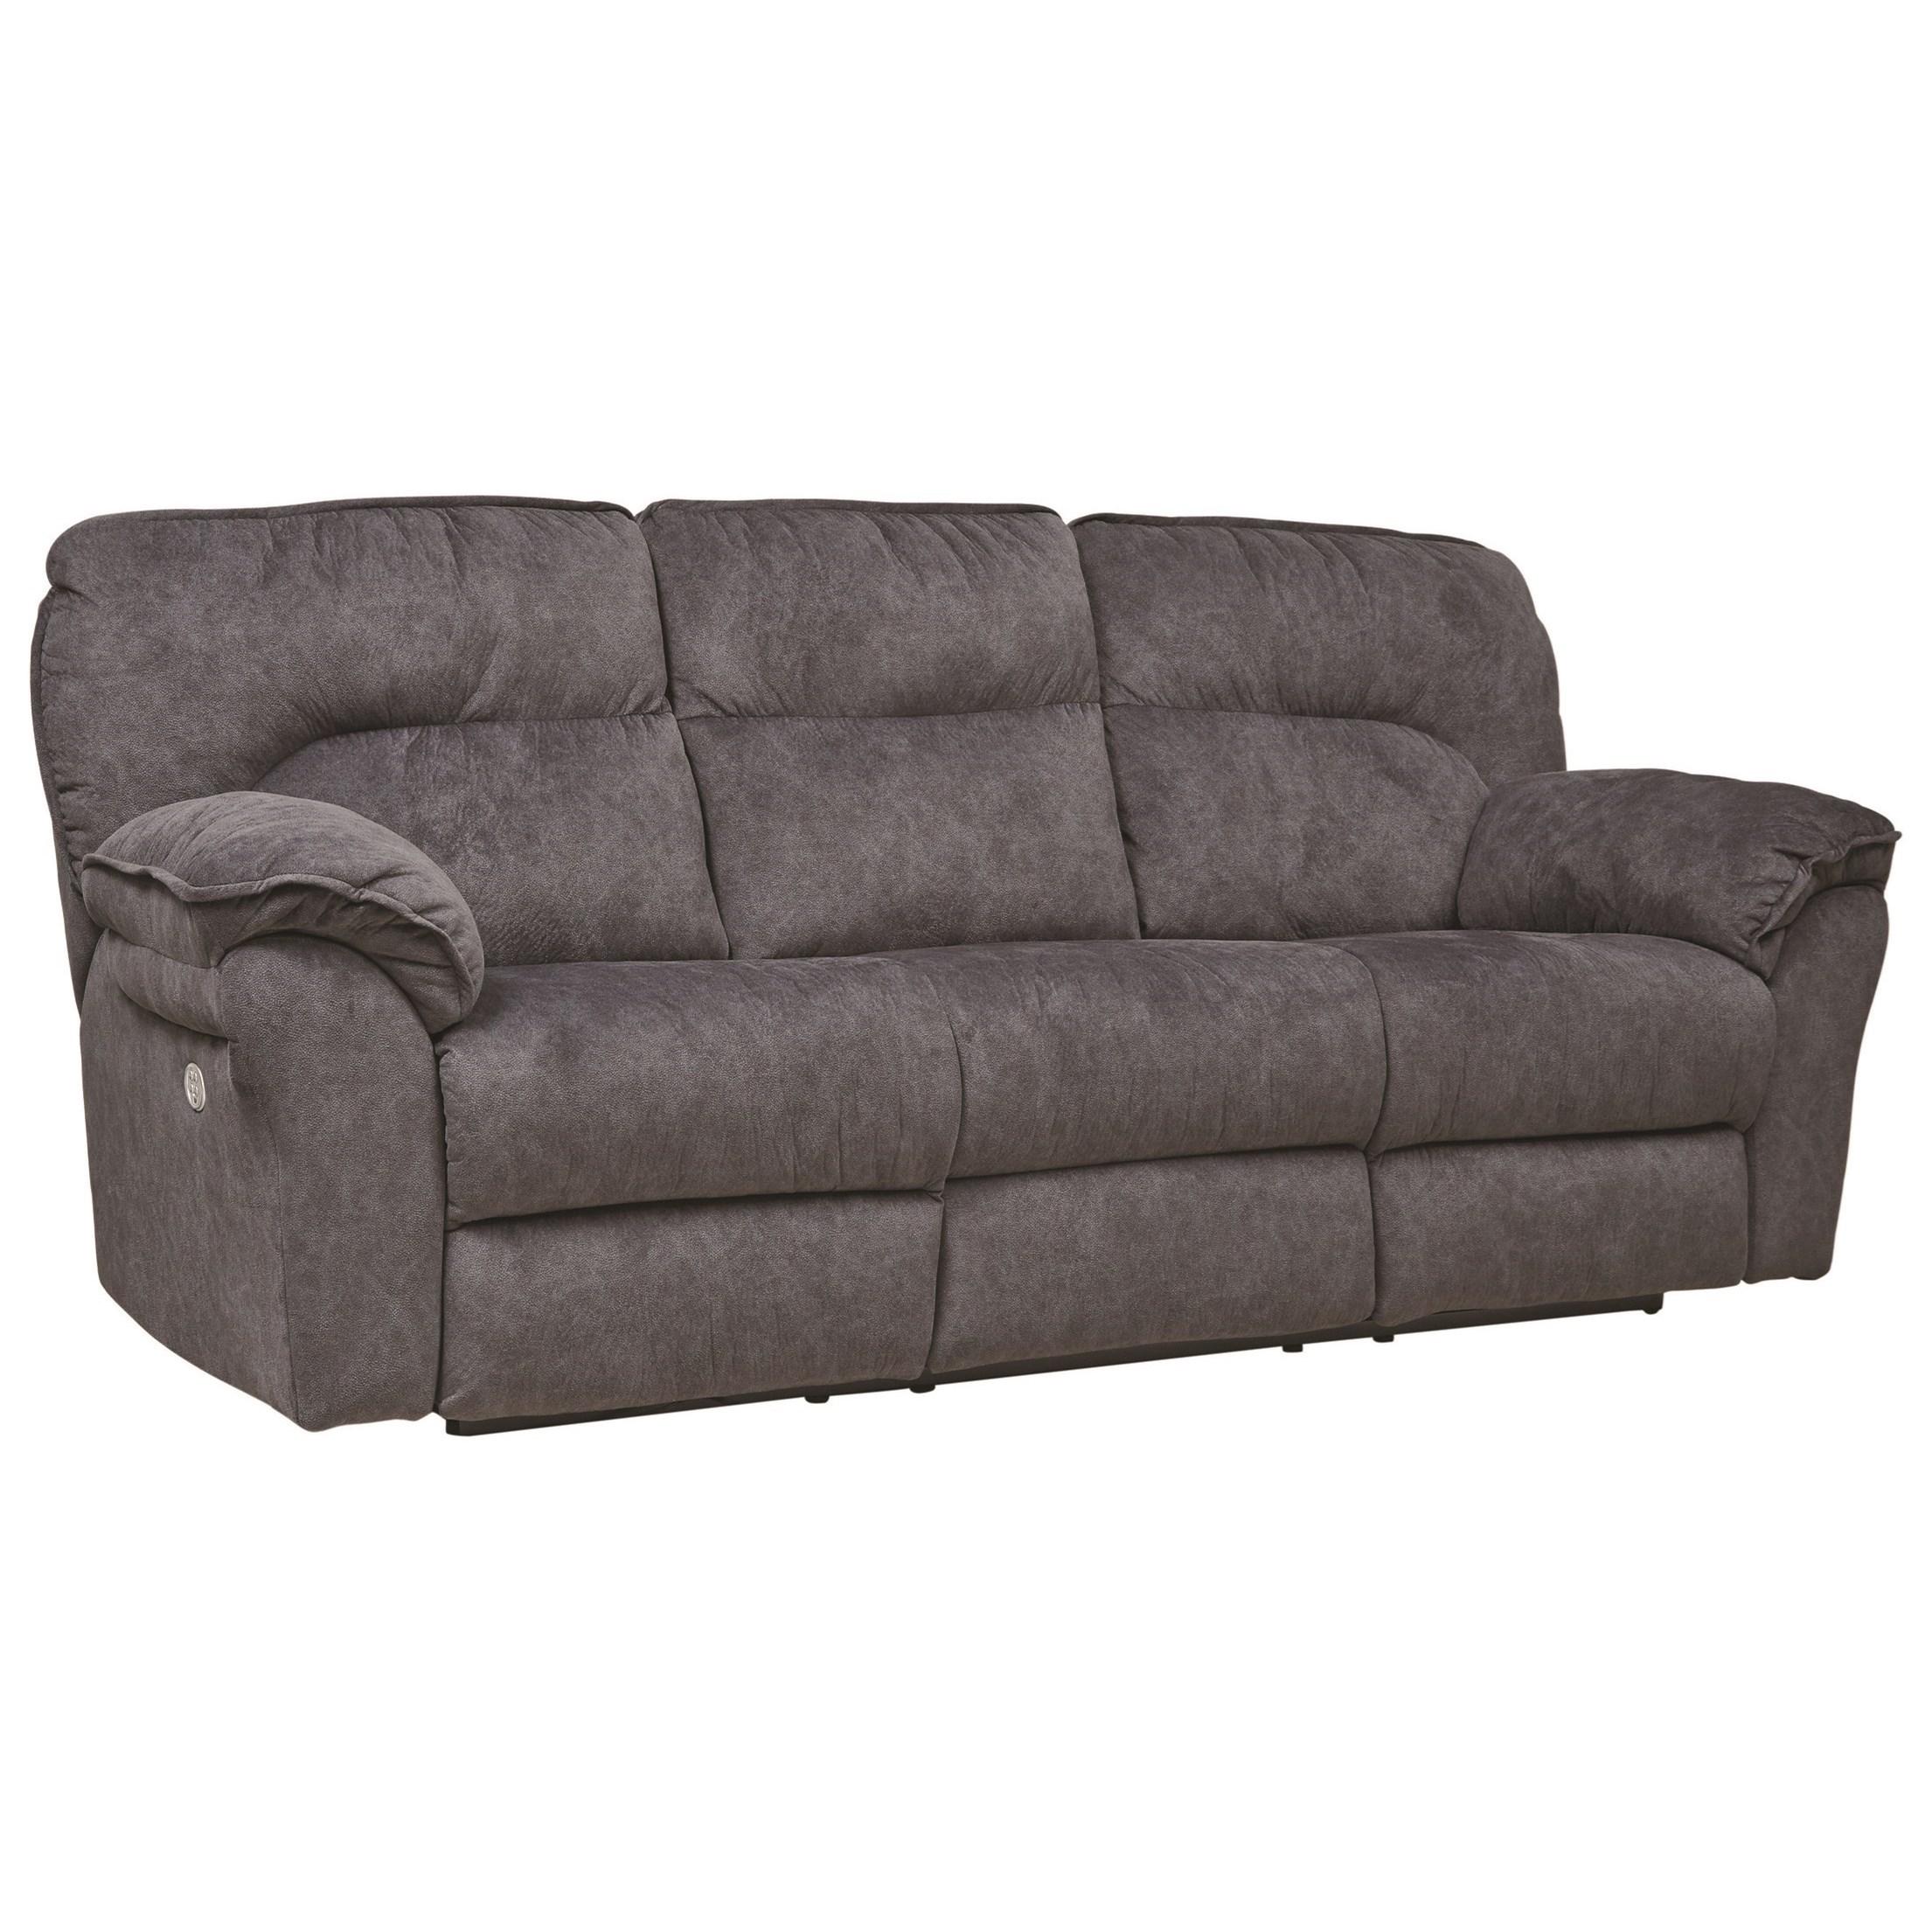 Dble Reclining Powerplus Sofa